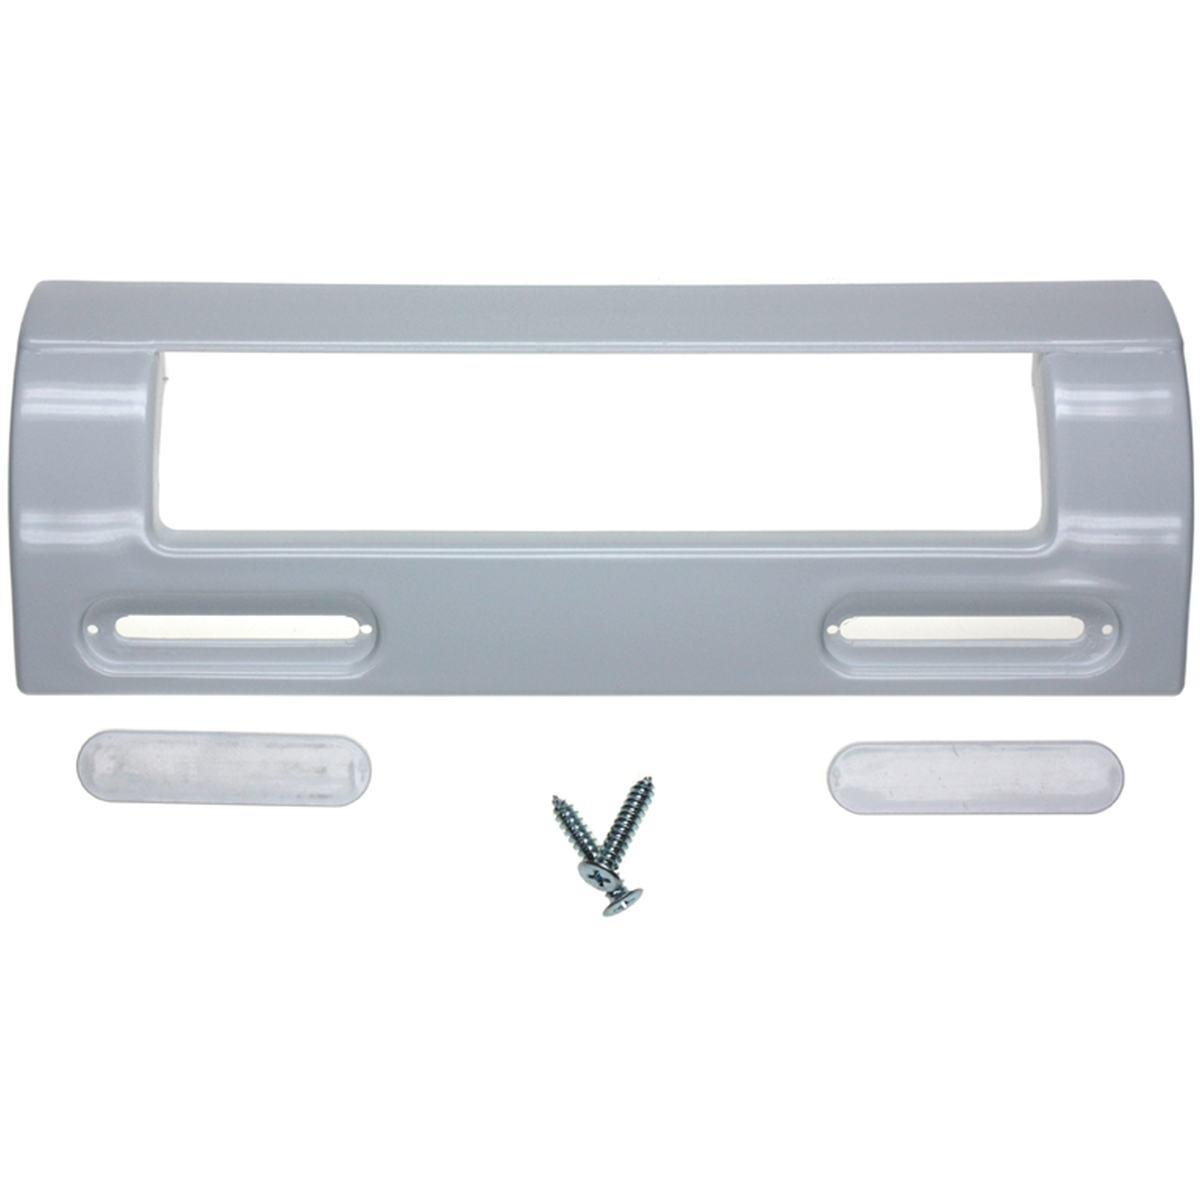 Dørgreb 200 x 75 mm. universal hvid flad